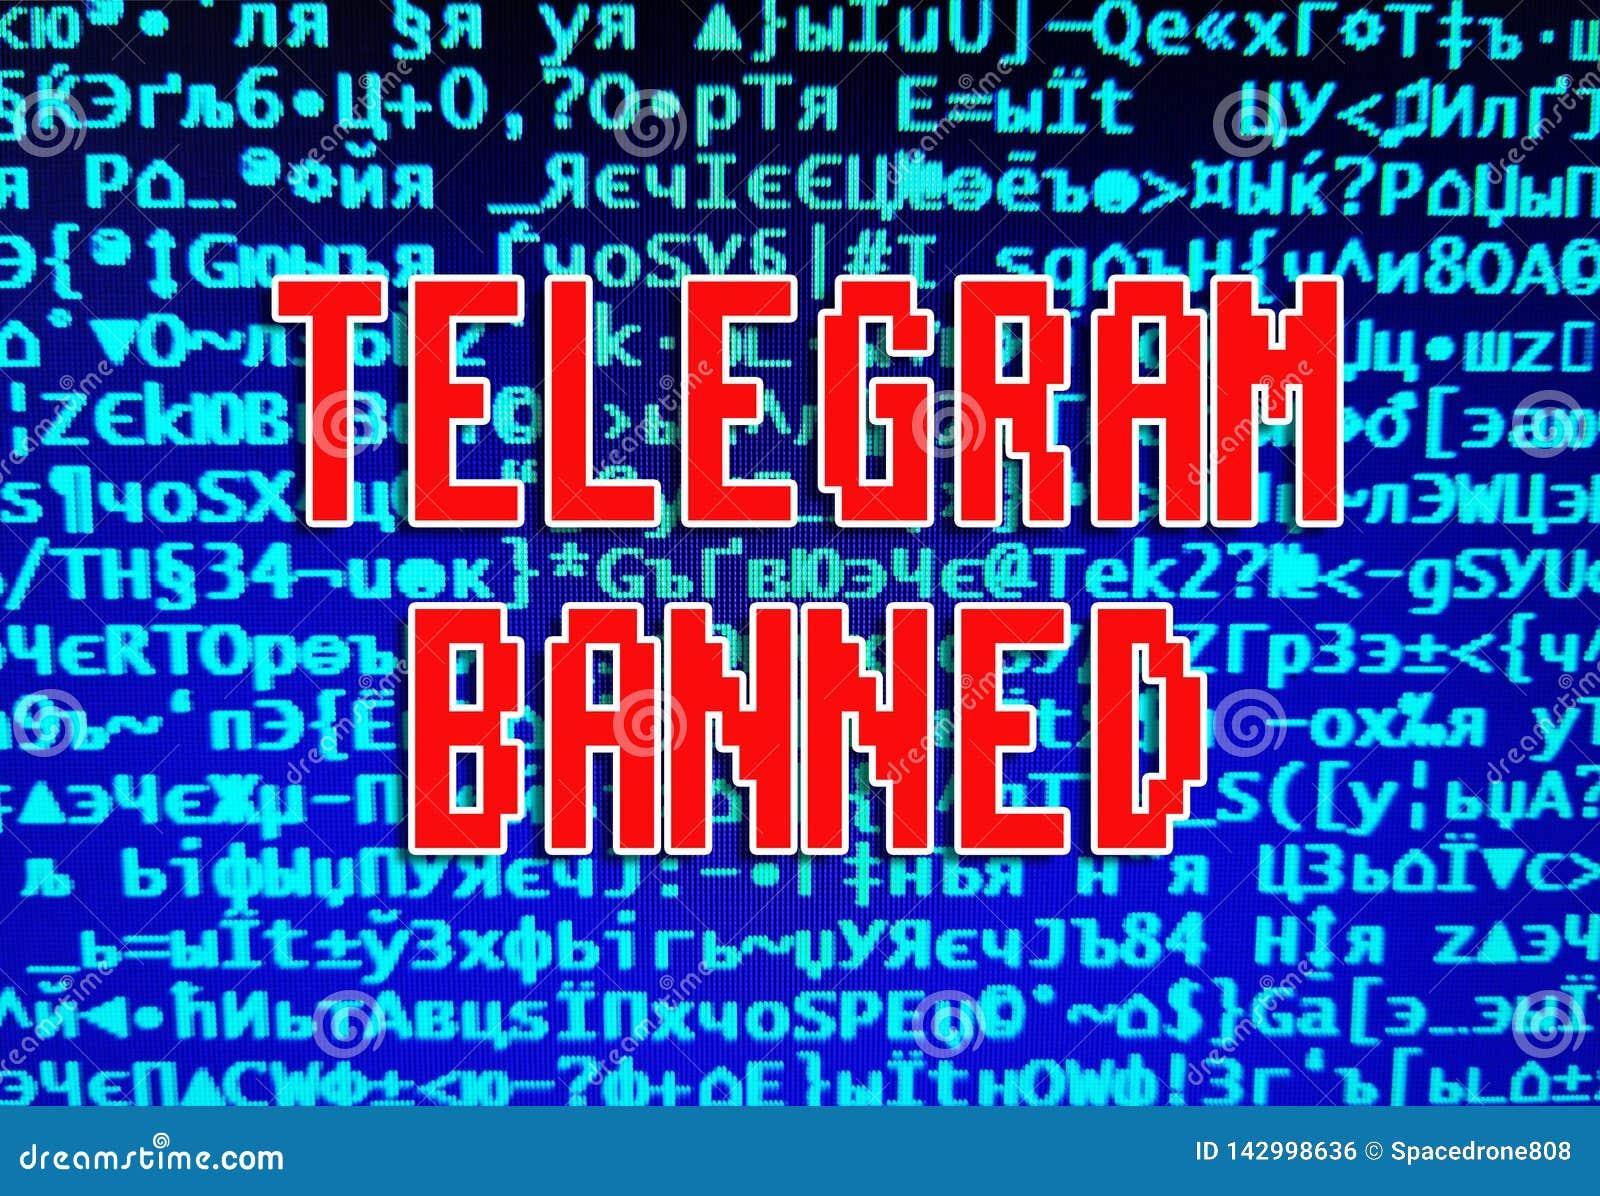 Telegram Chat Messenger Banned In Russia Illustration